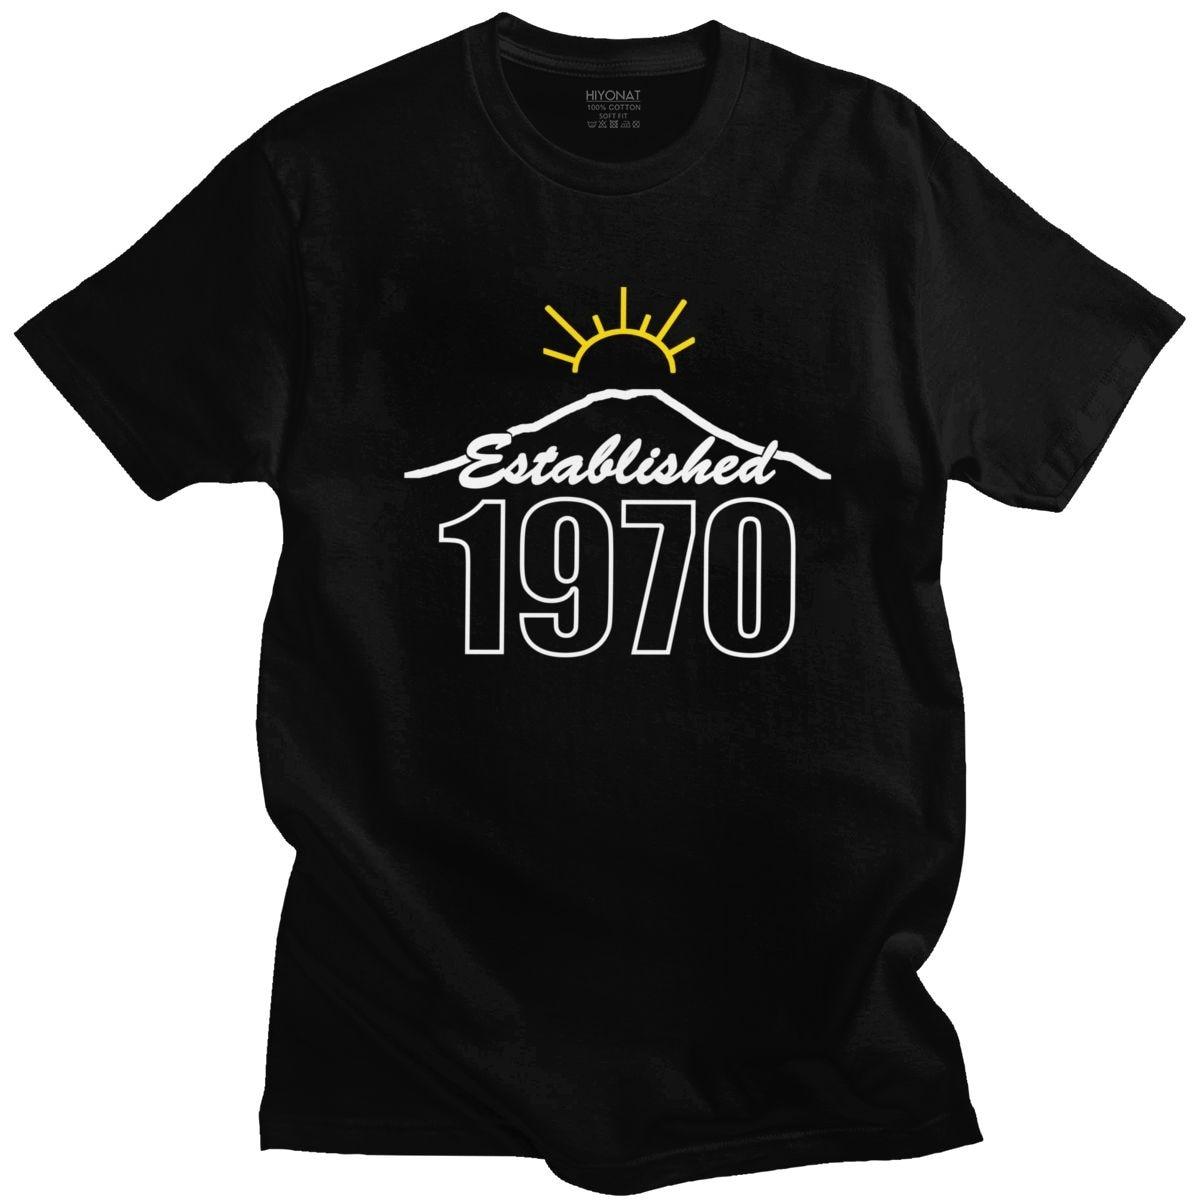 Urban Fashion Made in 1970 Tshirt Men O-neck Short Sleeve 50 Years Old T-shirt Birthday Gift Cotton Basic Tee Shirt Anniversary